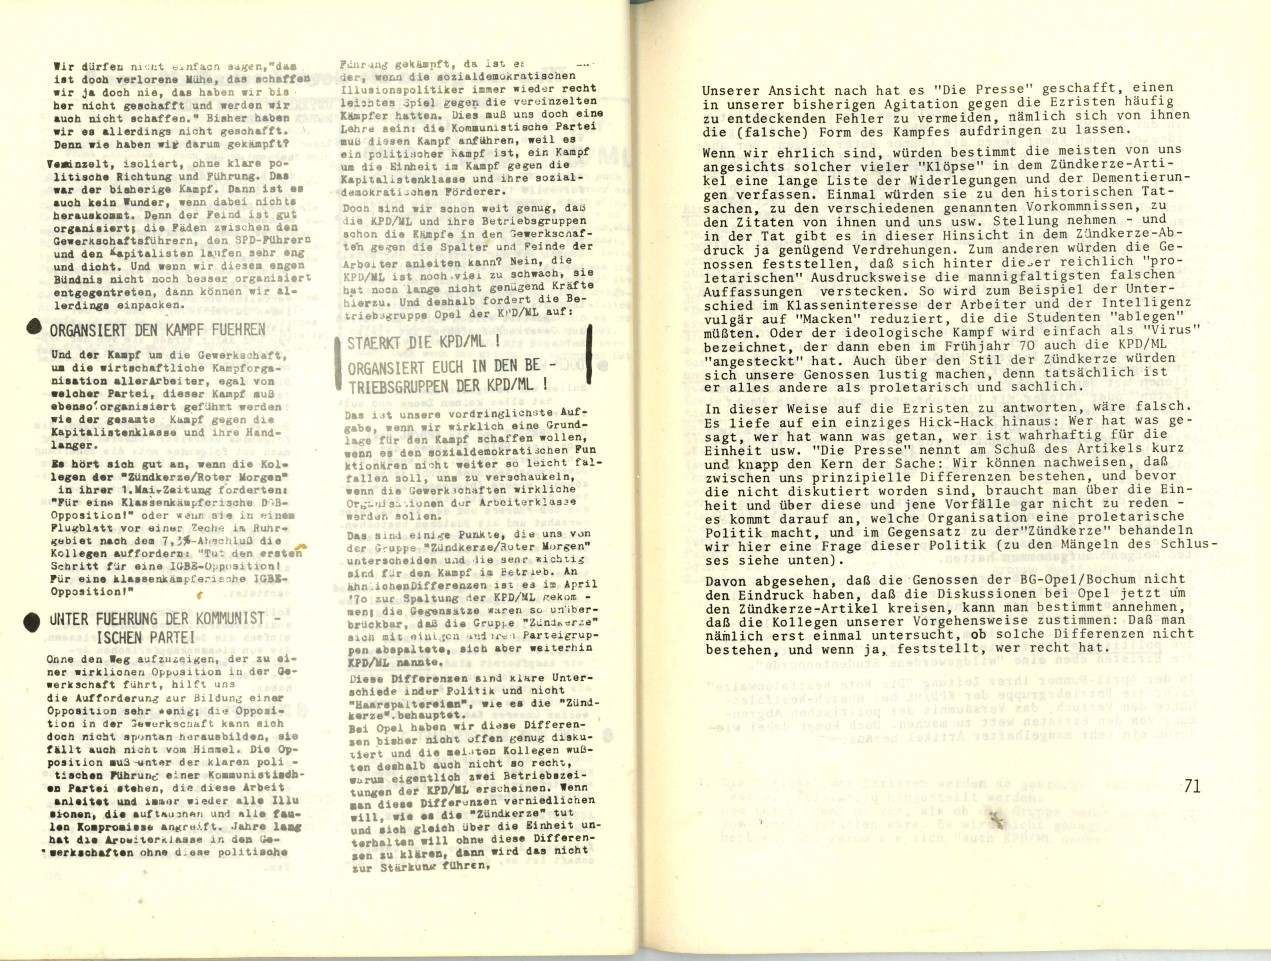 ZB_Parteiarbeiter_1971_06_37